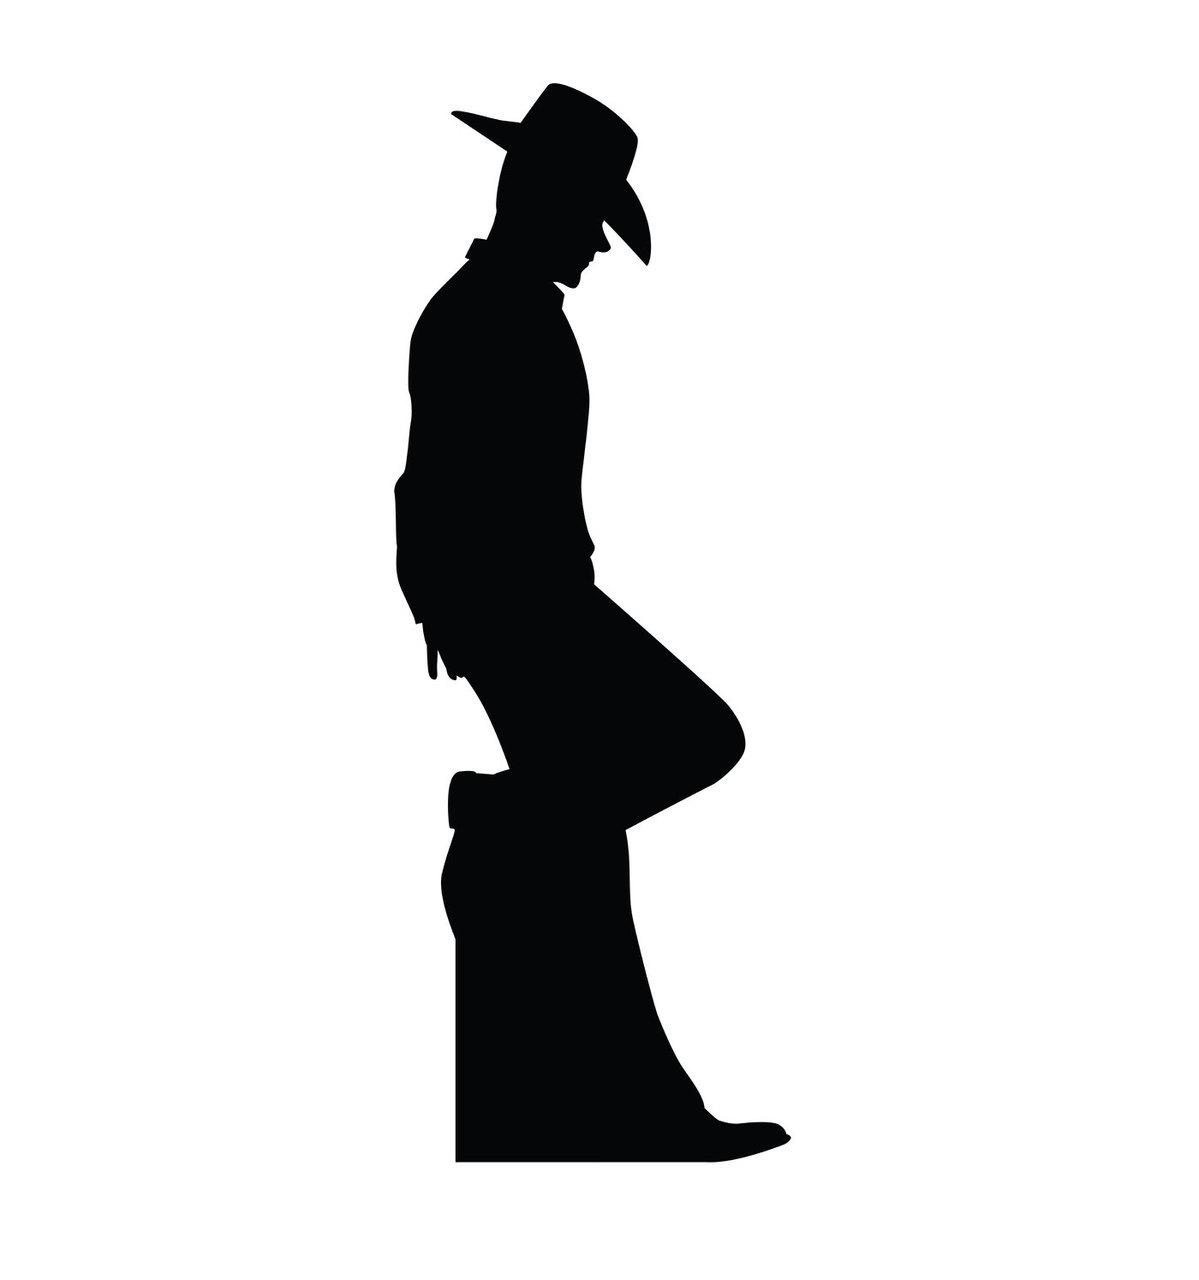 1199x1280 SU 2317 Cowboy Silhouette Cardboard Cutout Standup